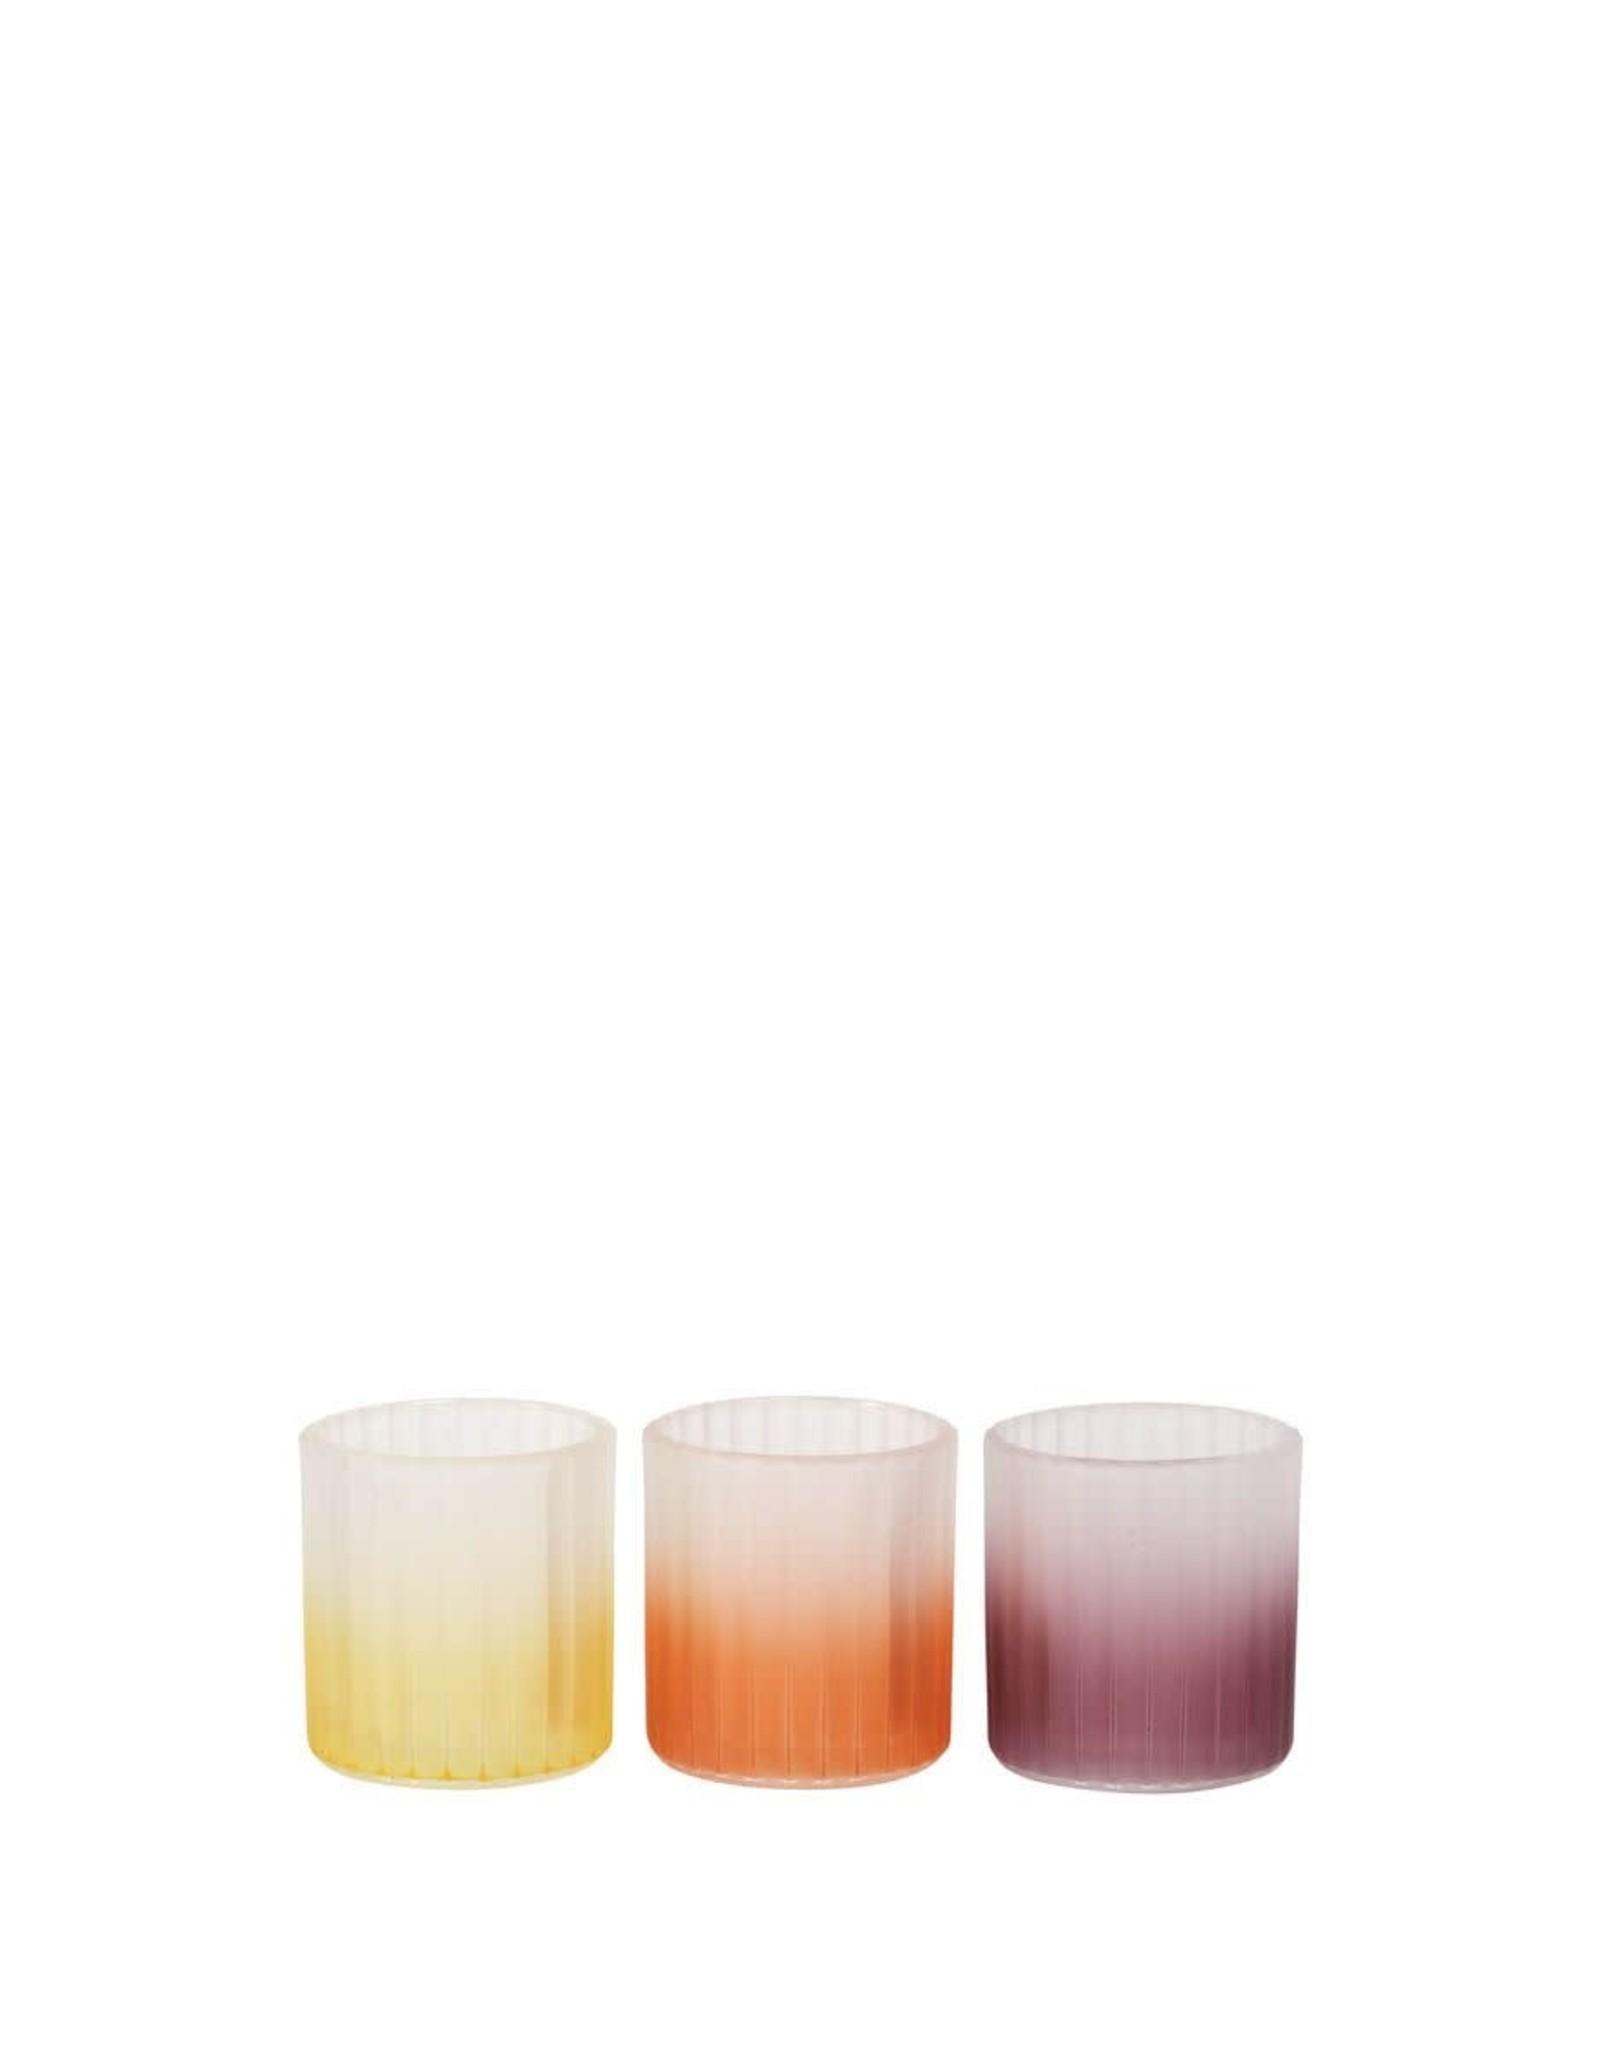 Waxinehouder D7XH8cm Mix Geel/Lila/Oranje Set/3